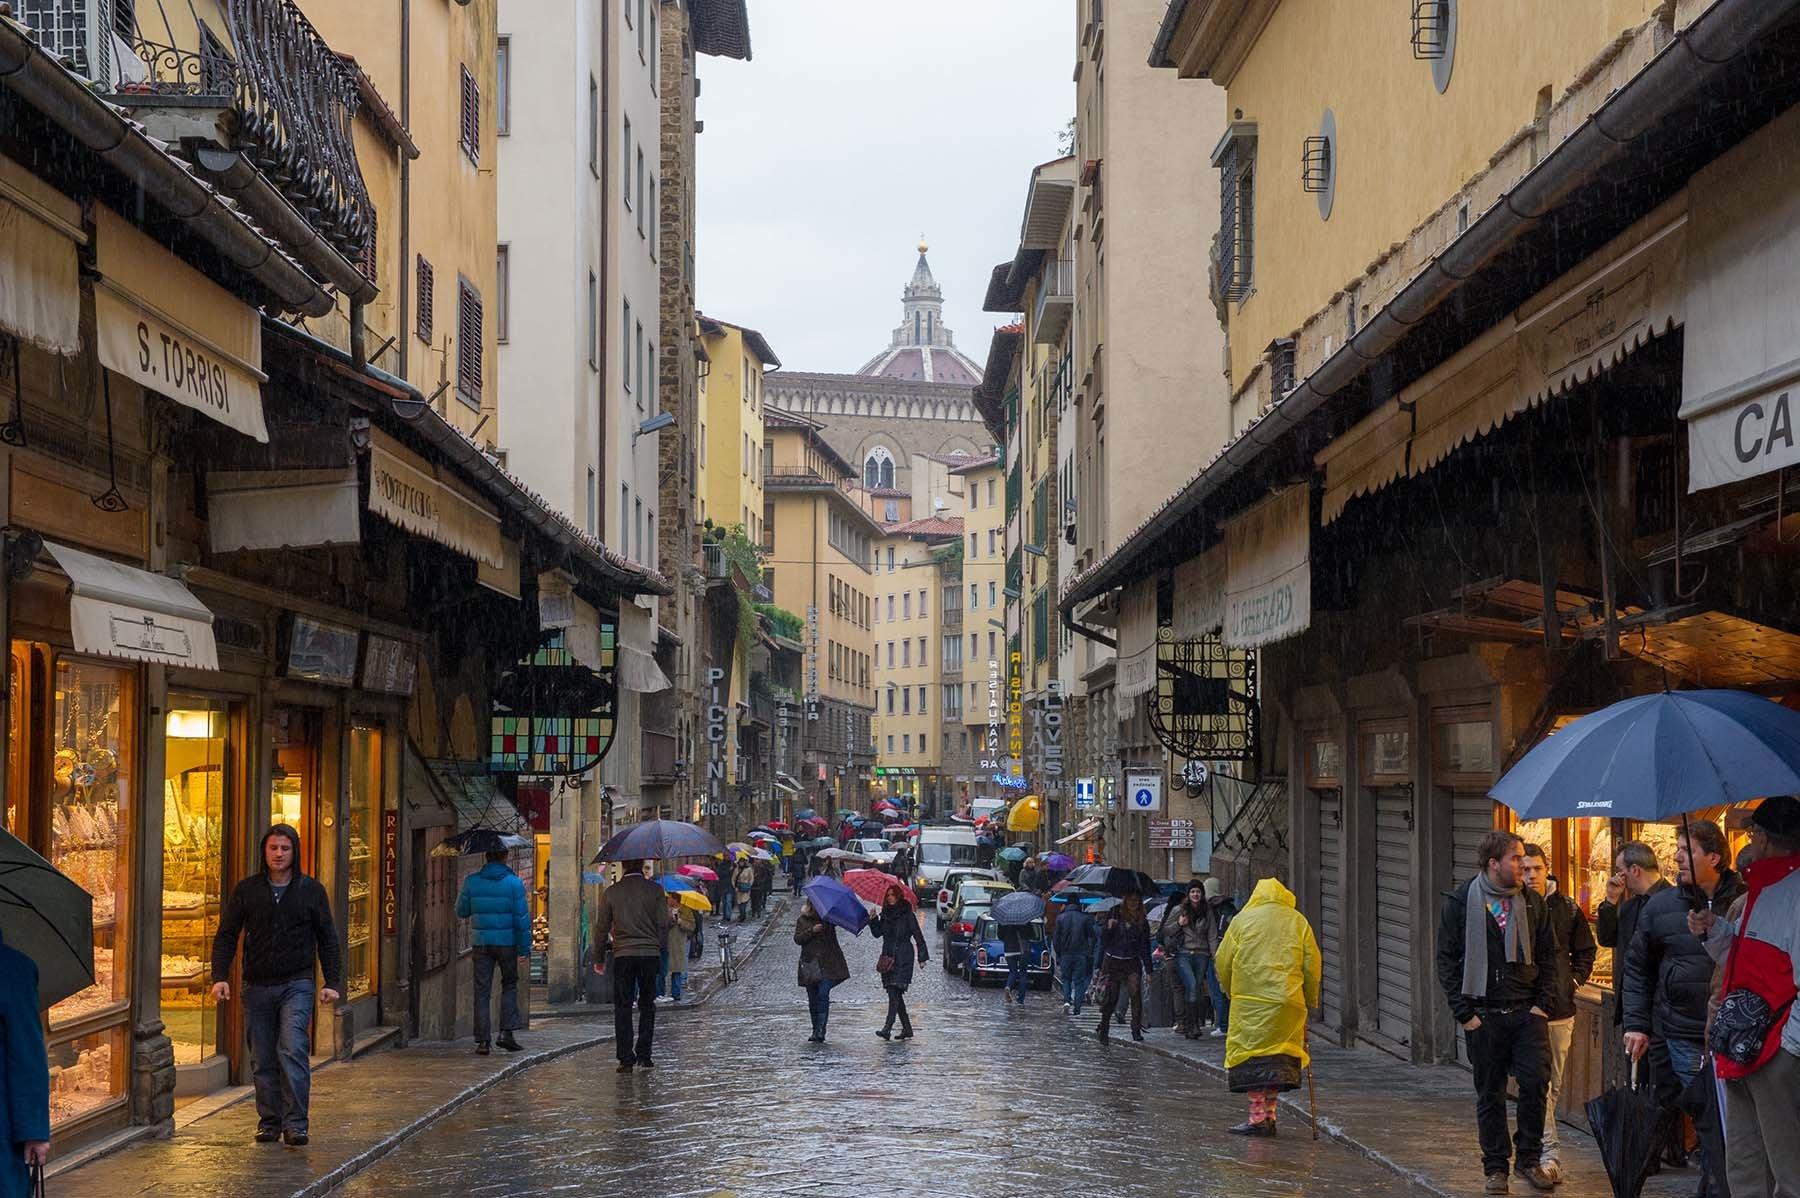 Deszczowa ulica na Ponte Vecchio we Florencji